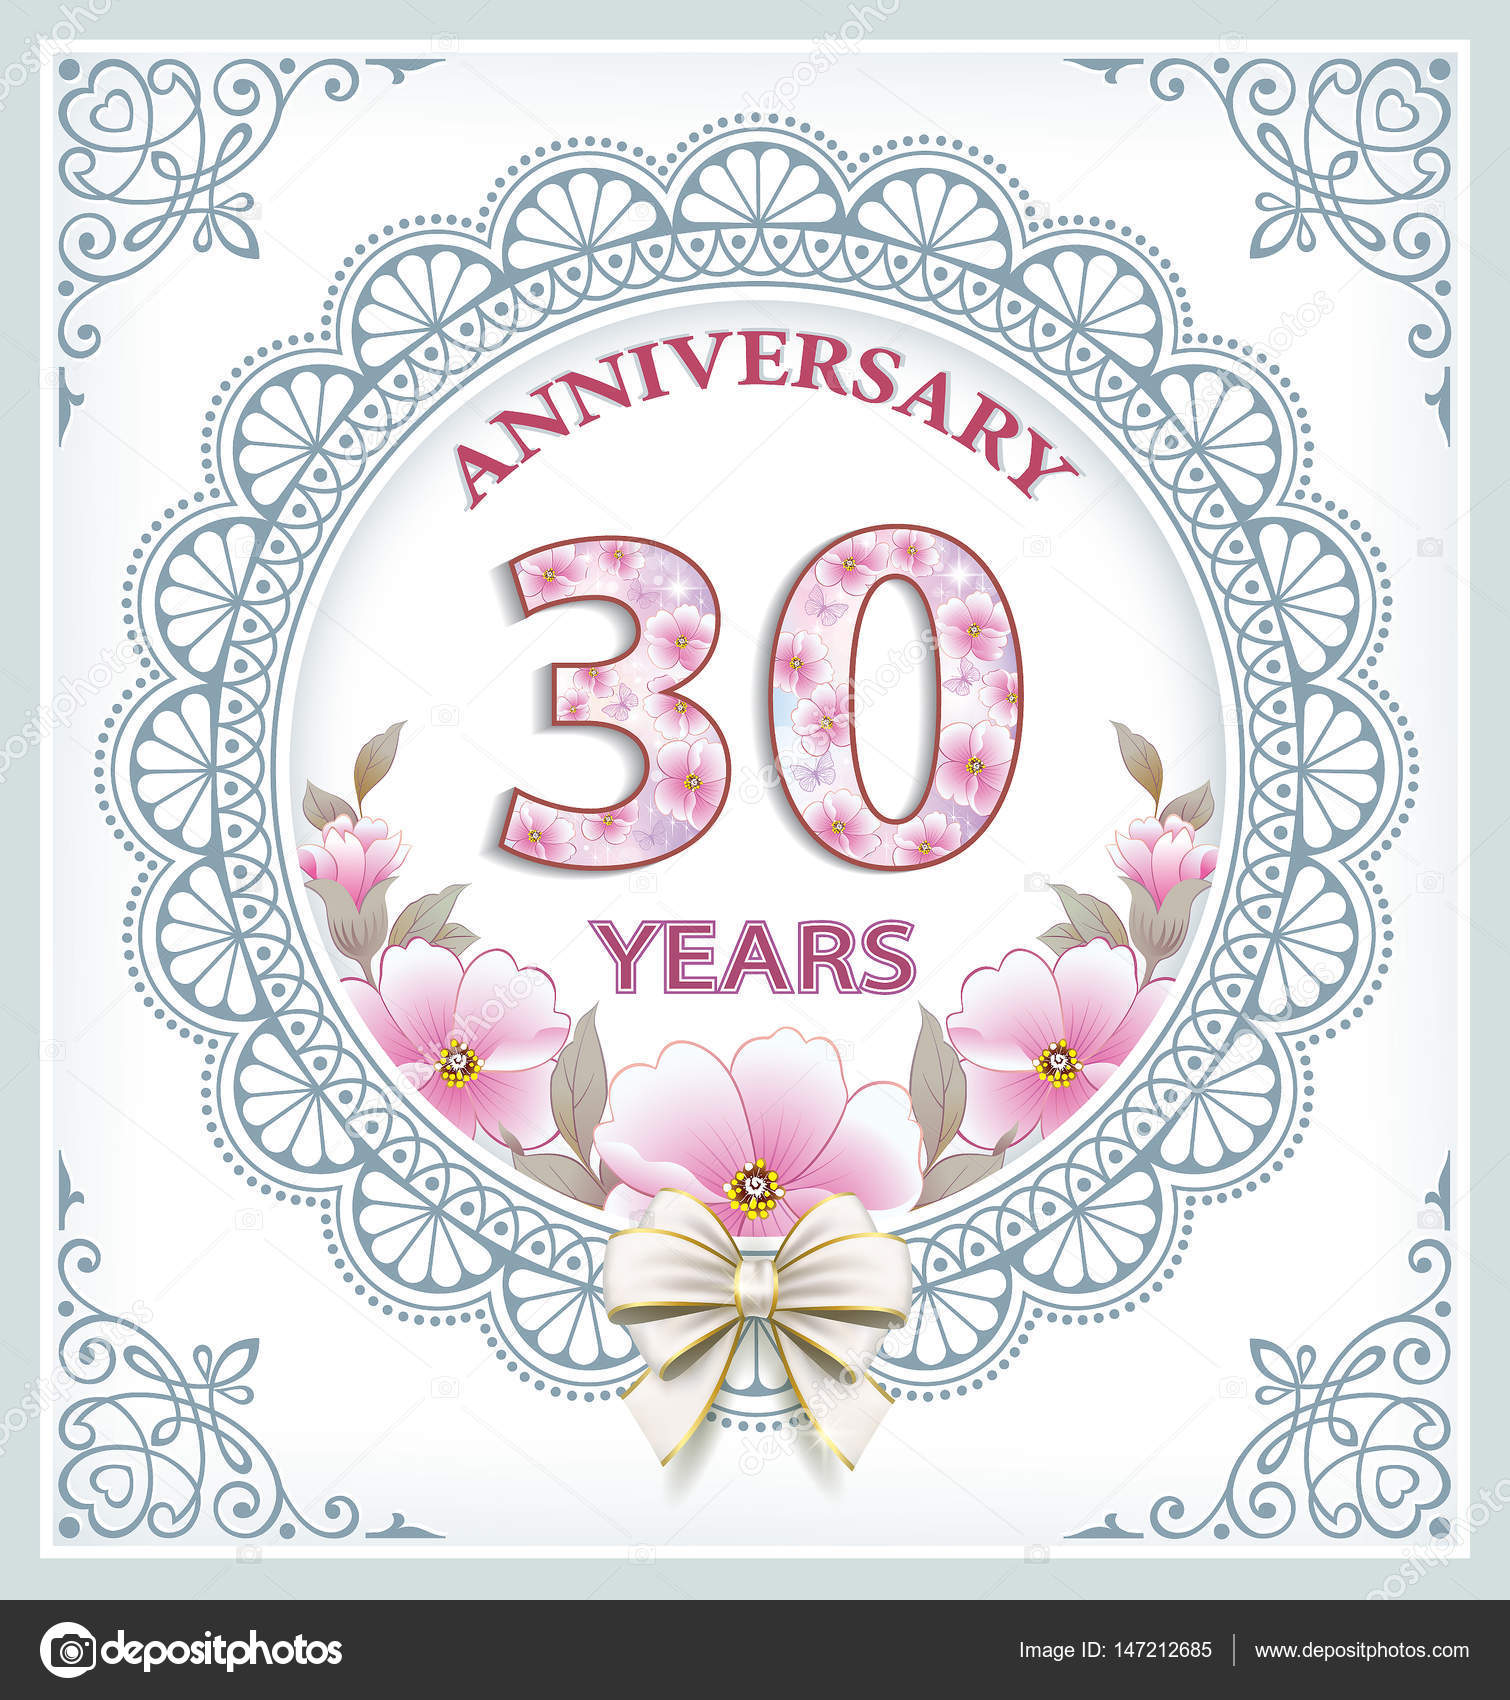 25 30 30 Helloworld: Tarjeta De Aniversario 30 Años